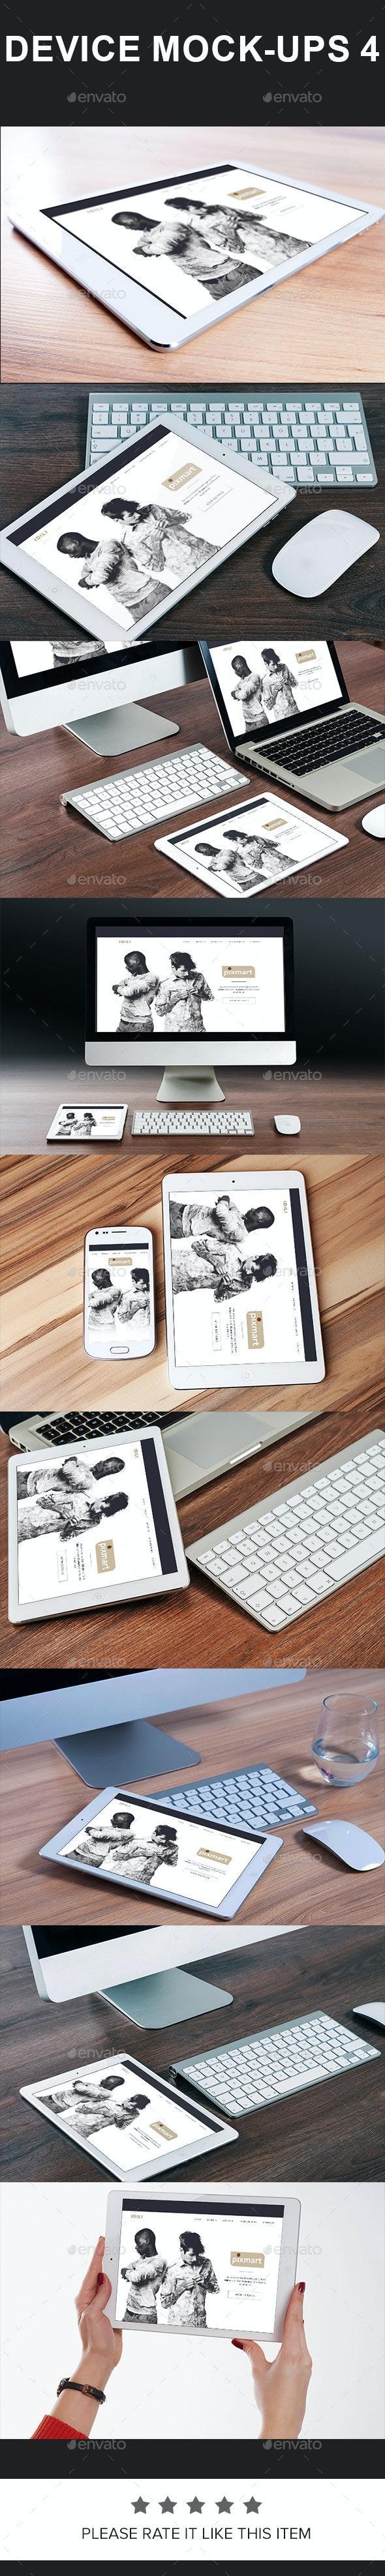 Device Mock-Ups 4 - Displays Product Mock-Ups